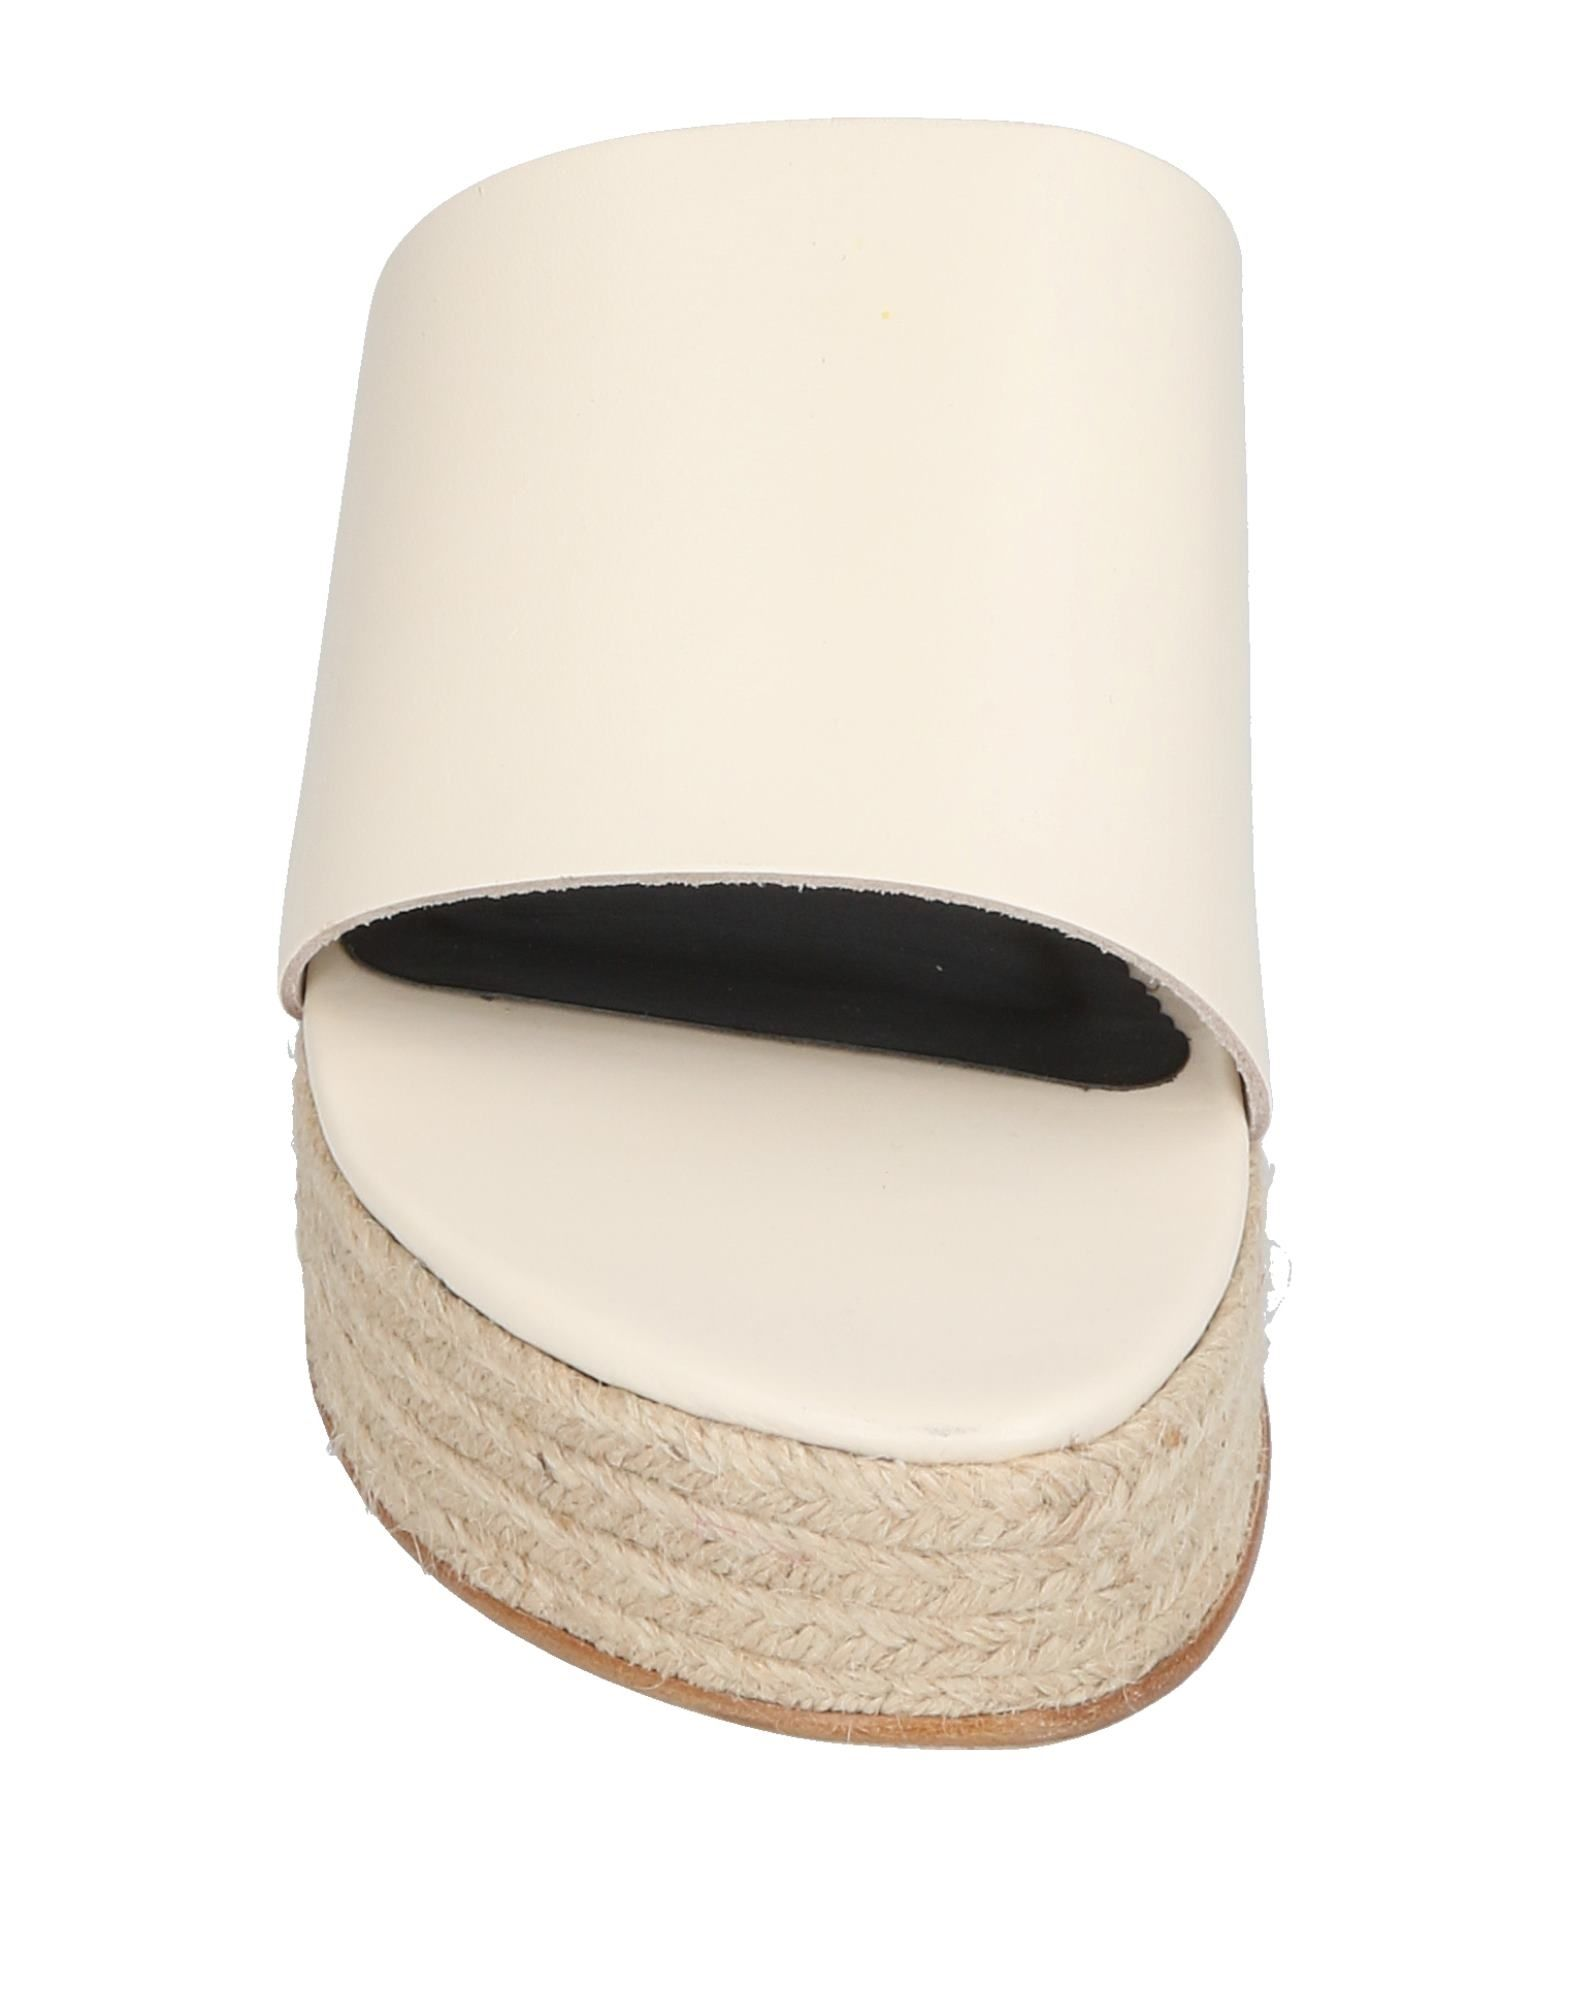 Sandales Tibi Femme - Sandales Tibi sur